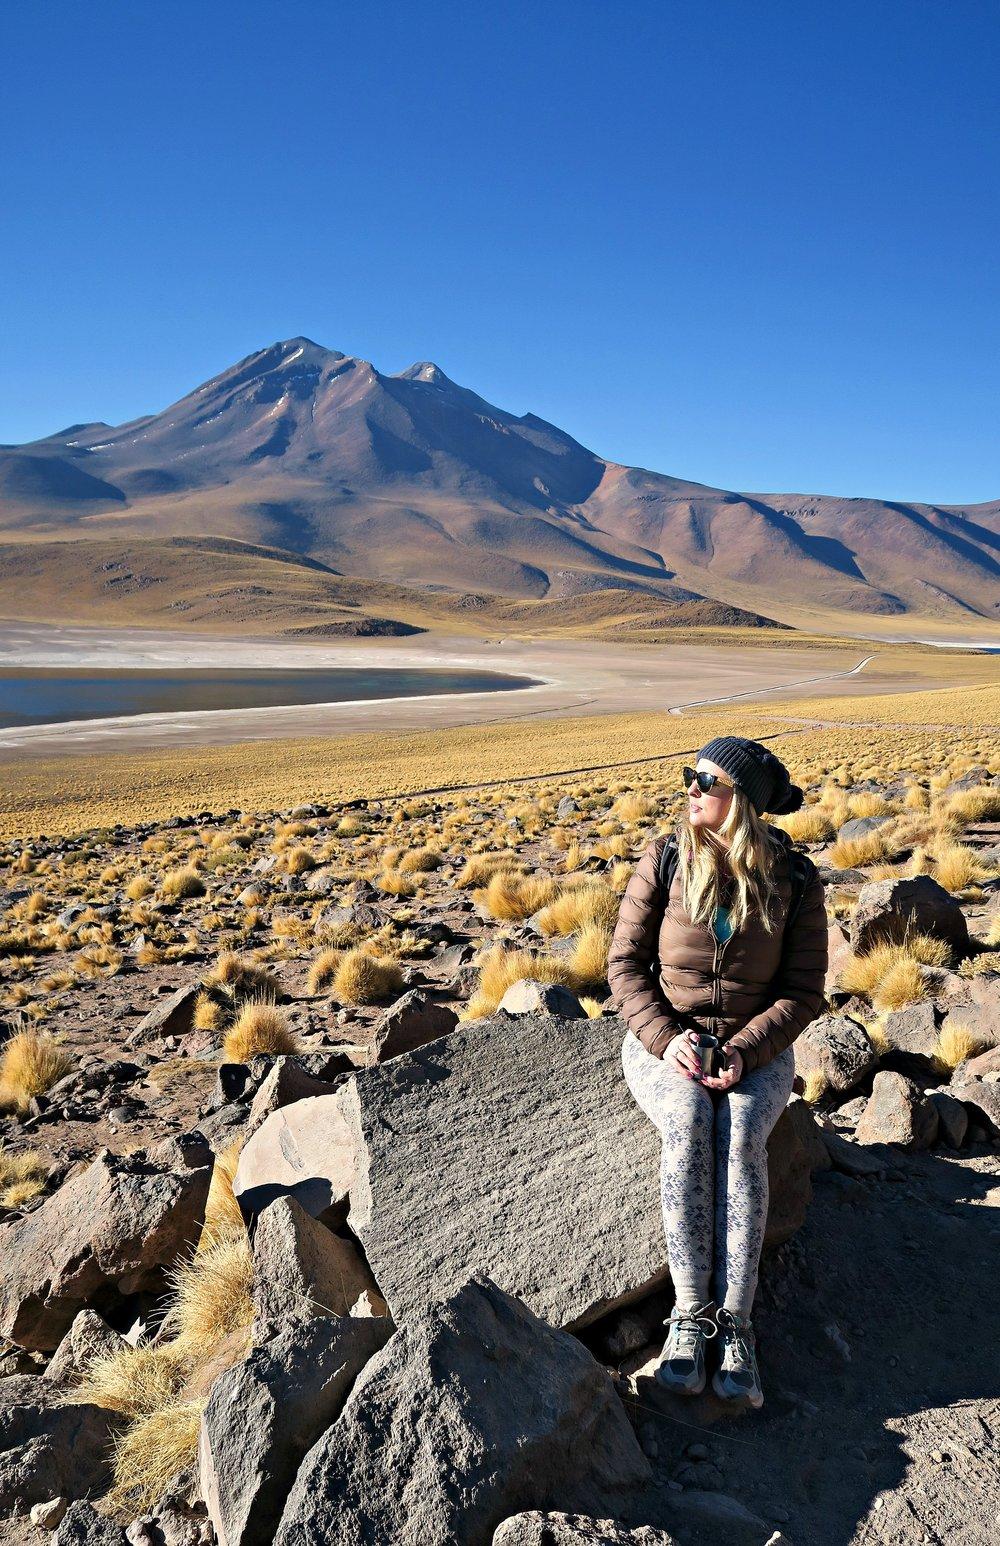 Highland Lakes - Lagunas Altiplánicas - Lagunas Miscanti y Meñiques - San Pedro de Atacama - Atacama Desert - Tip Top Planning